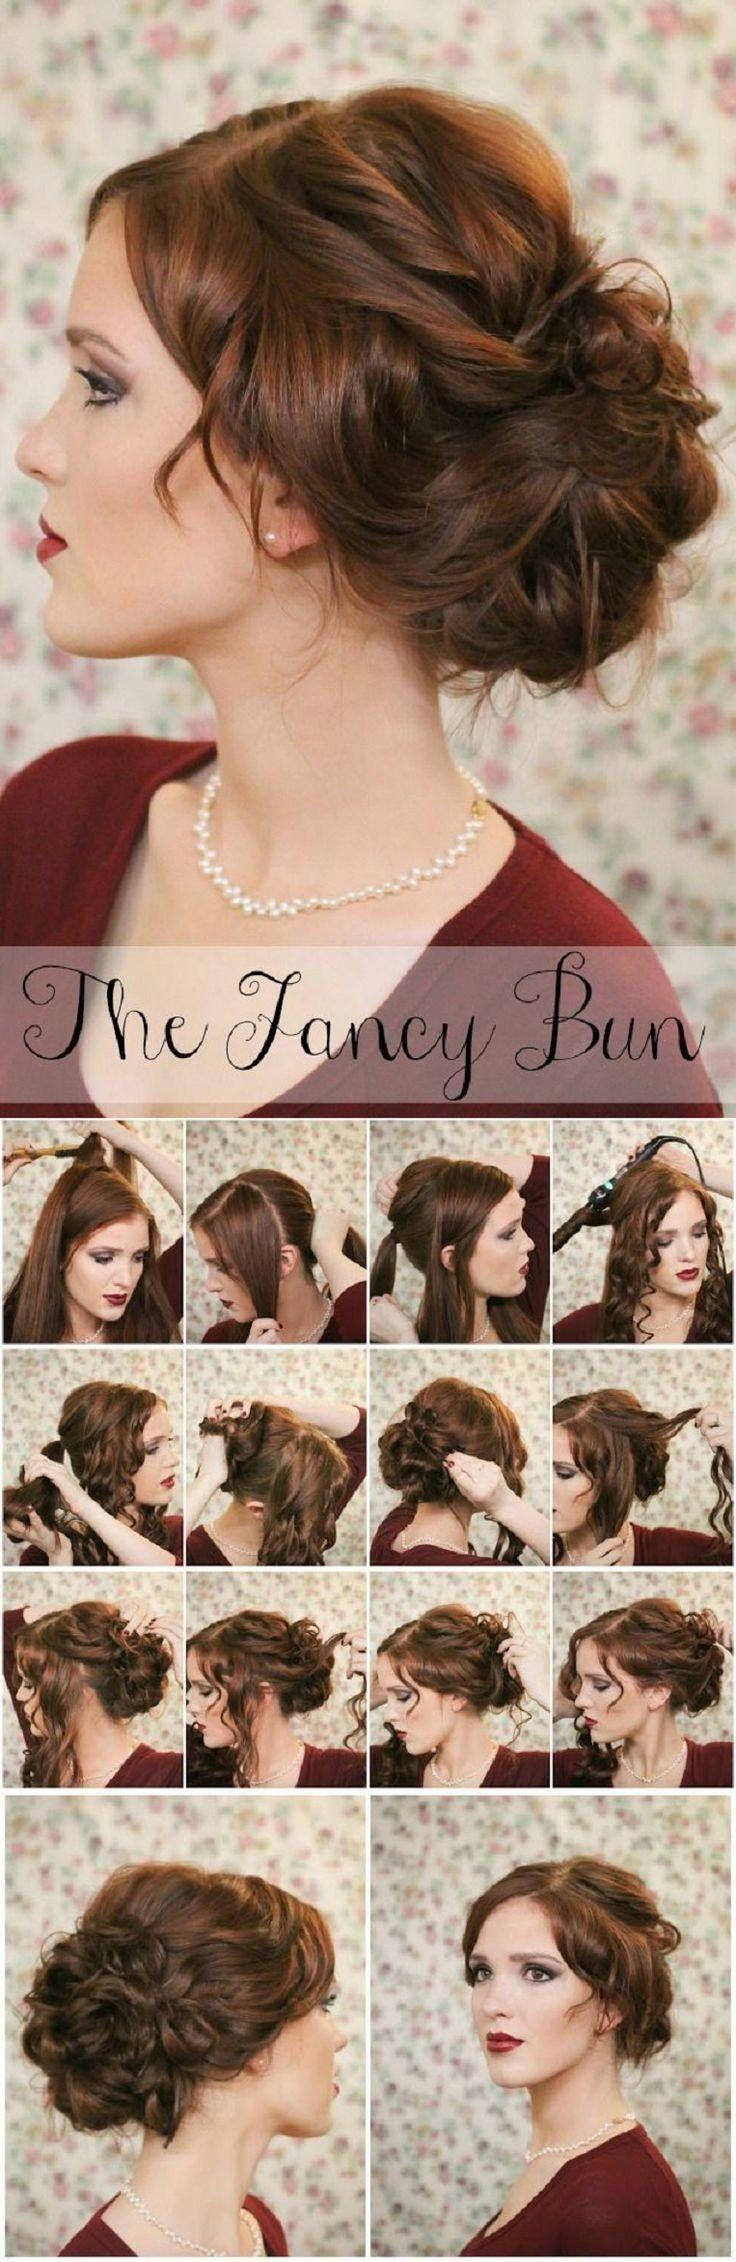 Pretty Braided Crown Hairstyle Tutorials and Ideas 9